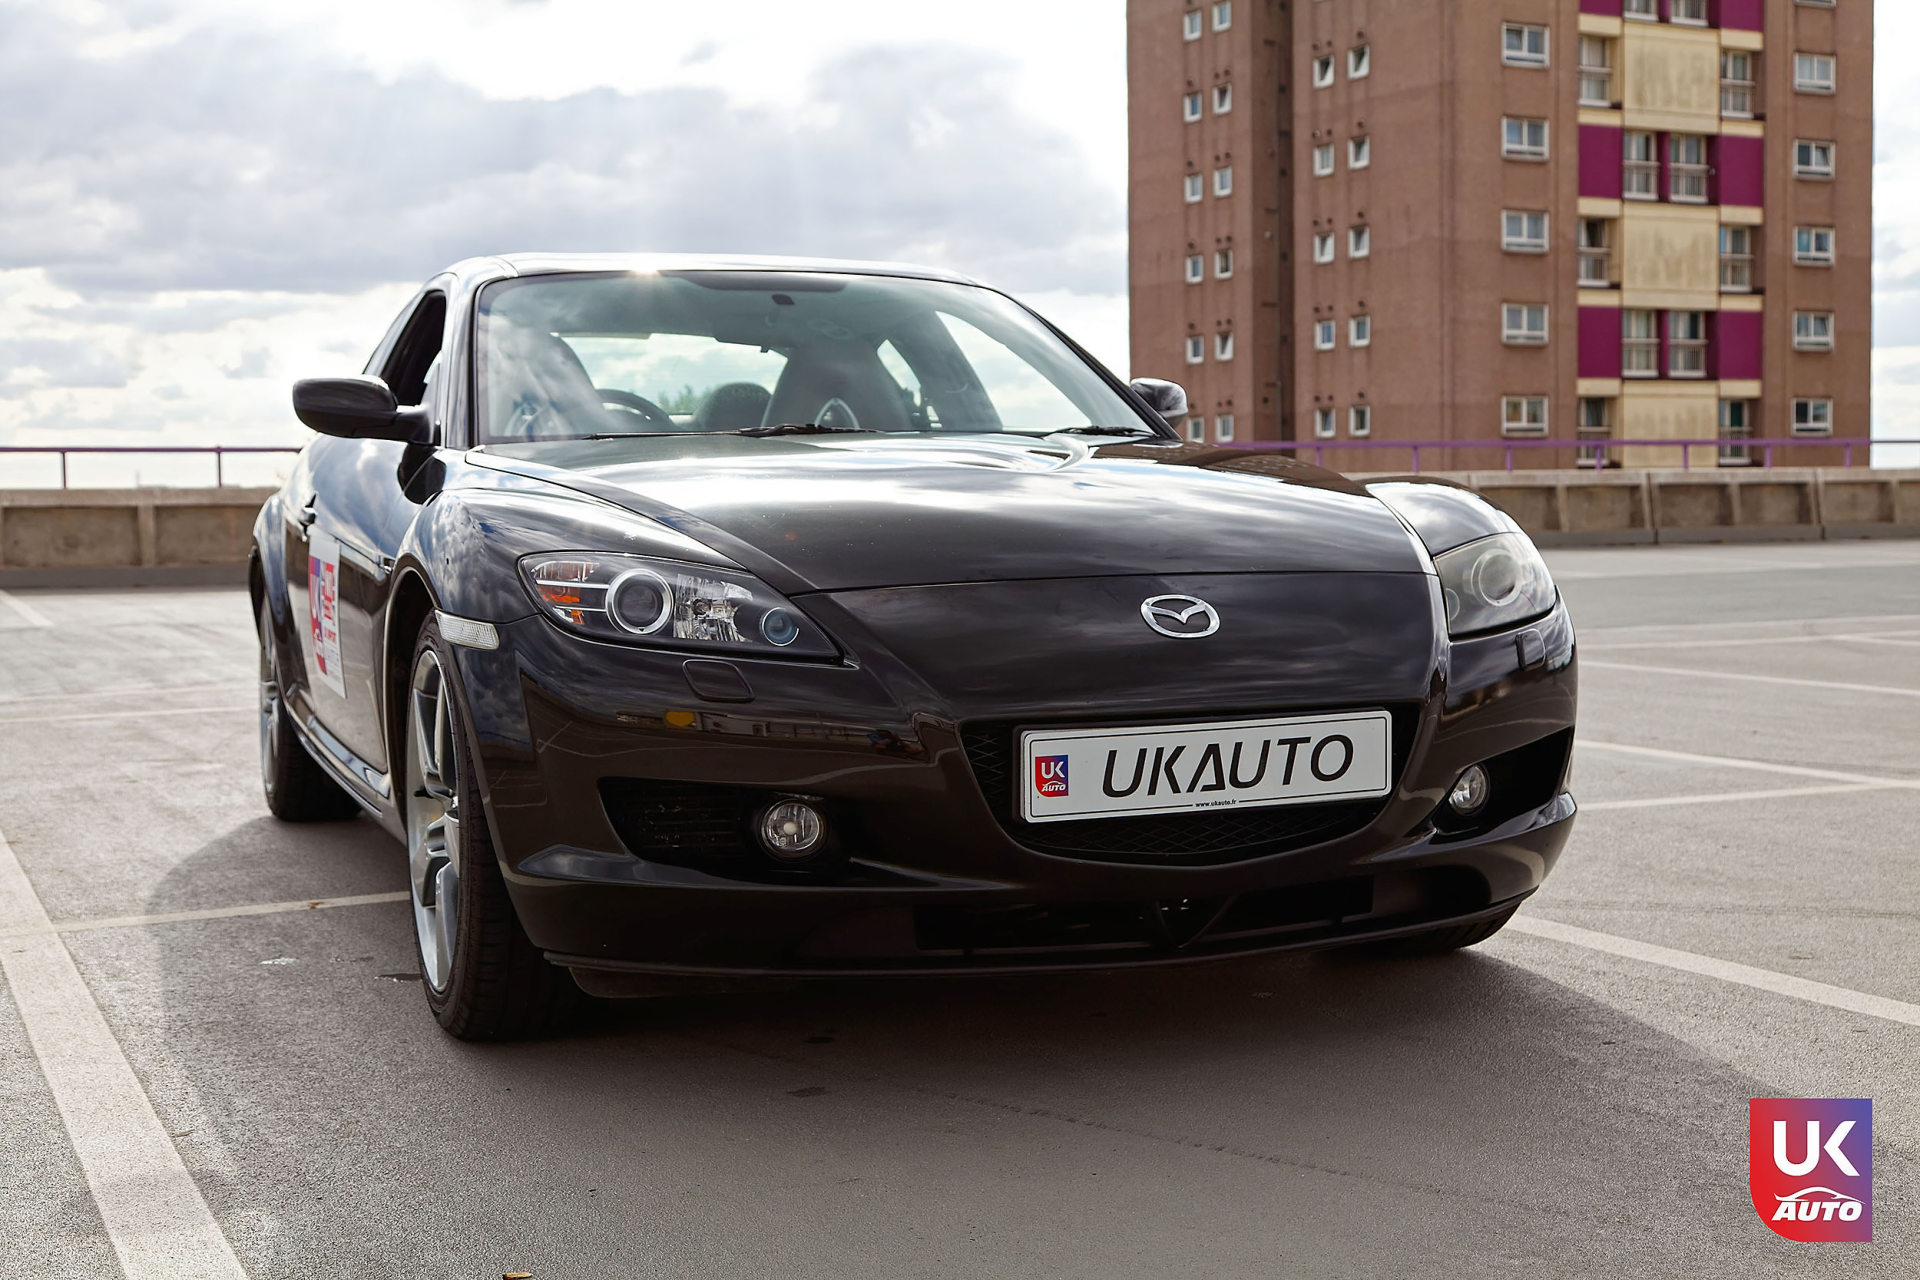 Mazda RX8 Rotary mazda angleterre mazda uk RX8 KURO import uk rhd1 DxO - Import Mazda RX8 KURO ROTARY depuis Autotrader par UKAUTO site annonces UK rhd Felicitation a Dimitri